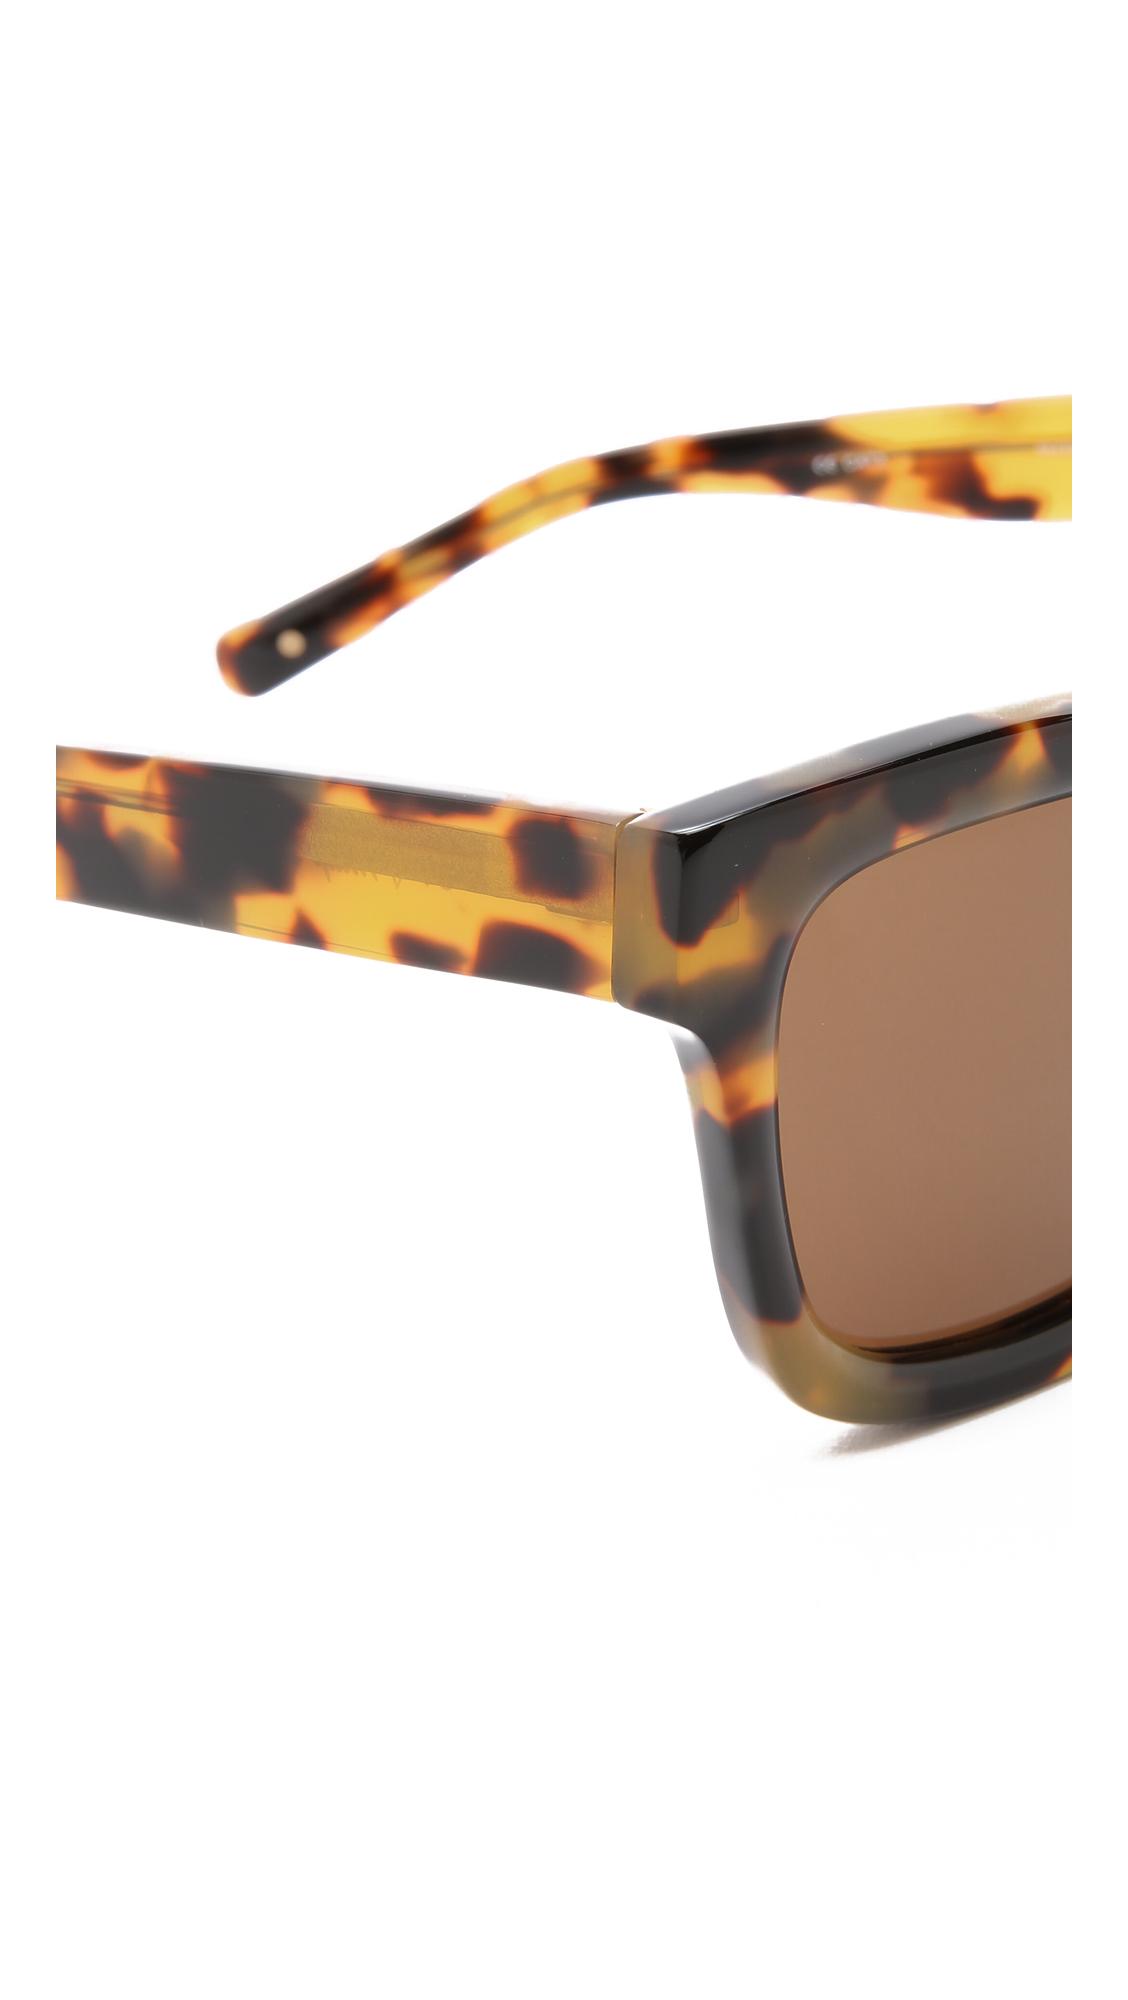 3.1 Phillip Lim Square Sunglasses in Graphic t Shell/Brown (Brown)